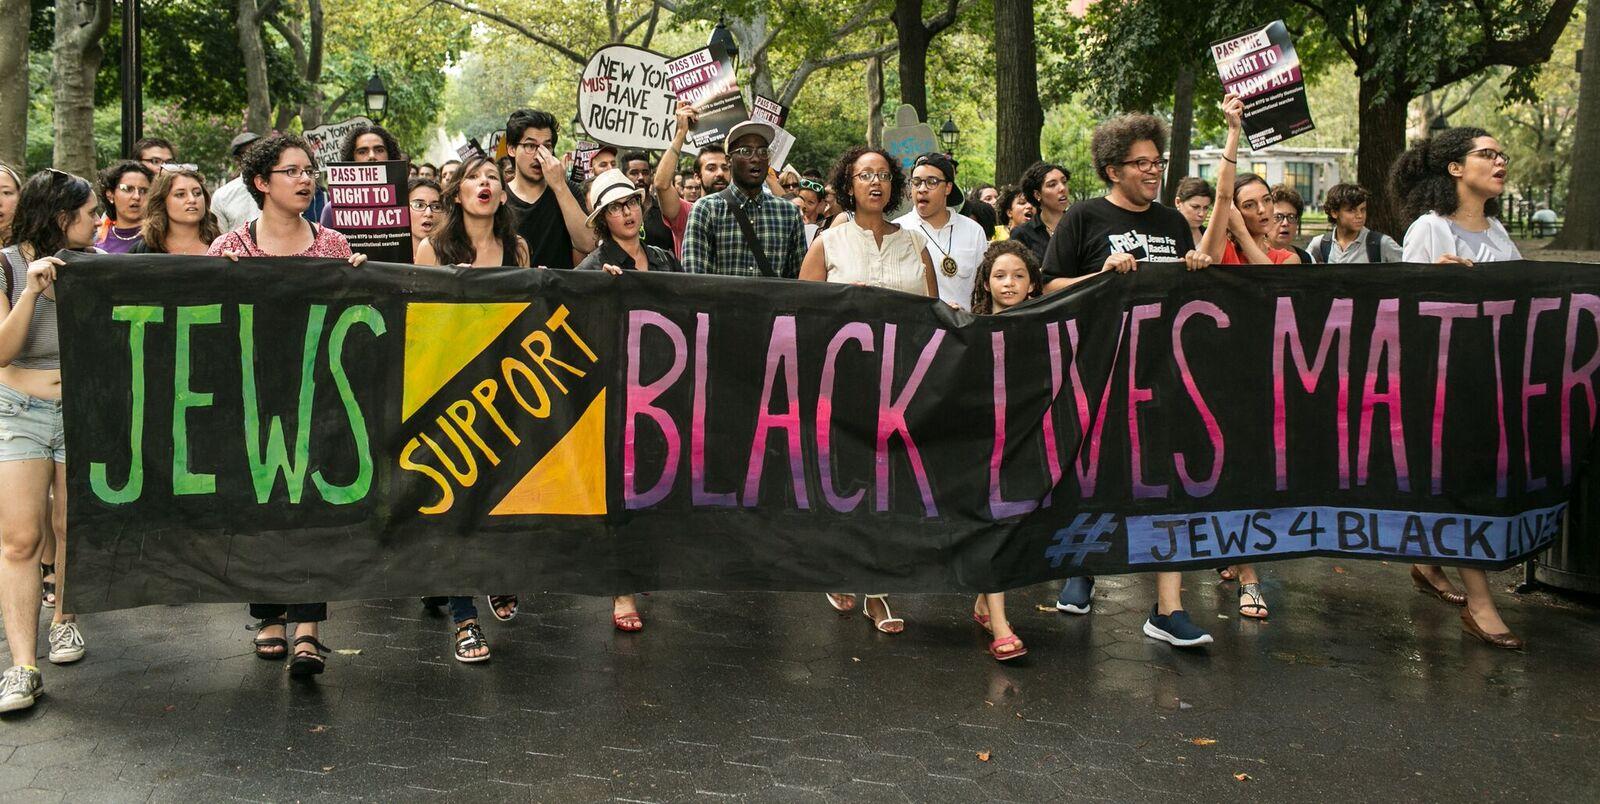 #BlackLivesMatter protest by Jews for Racial and Economic Justice (JFREJ)